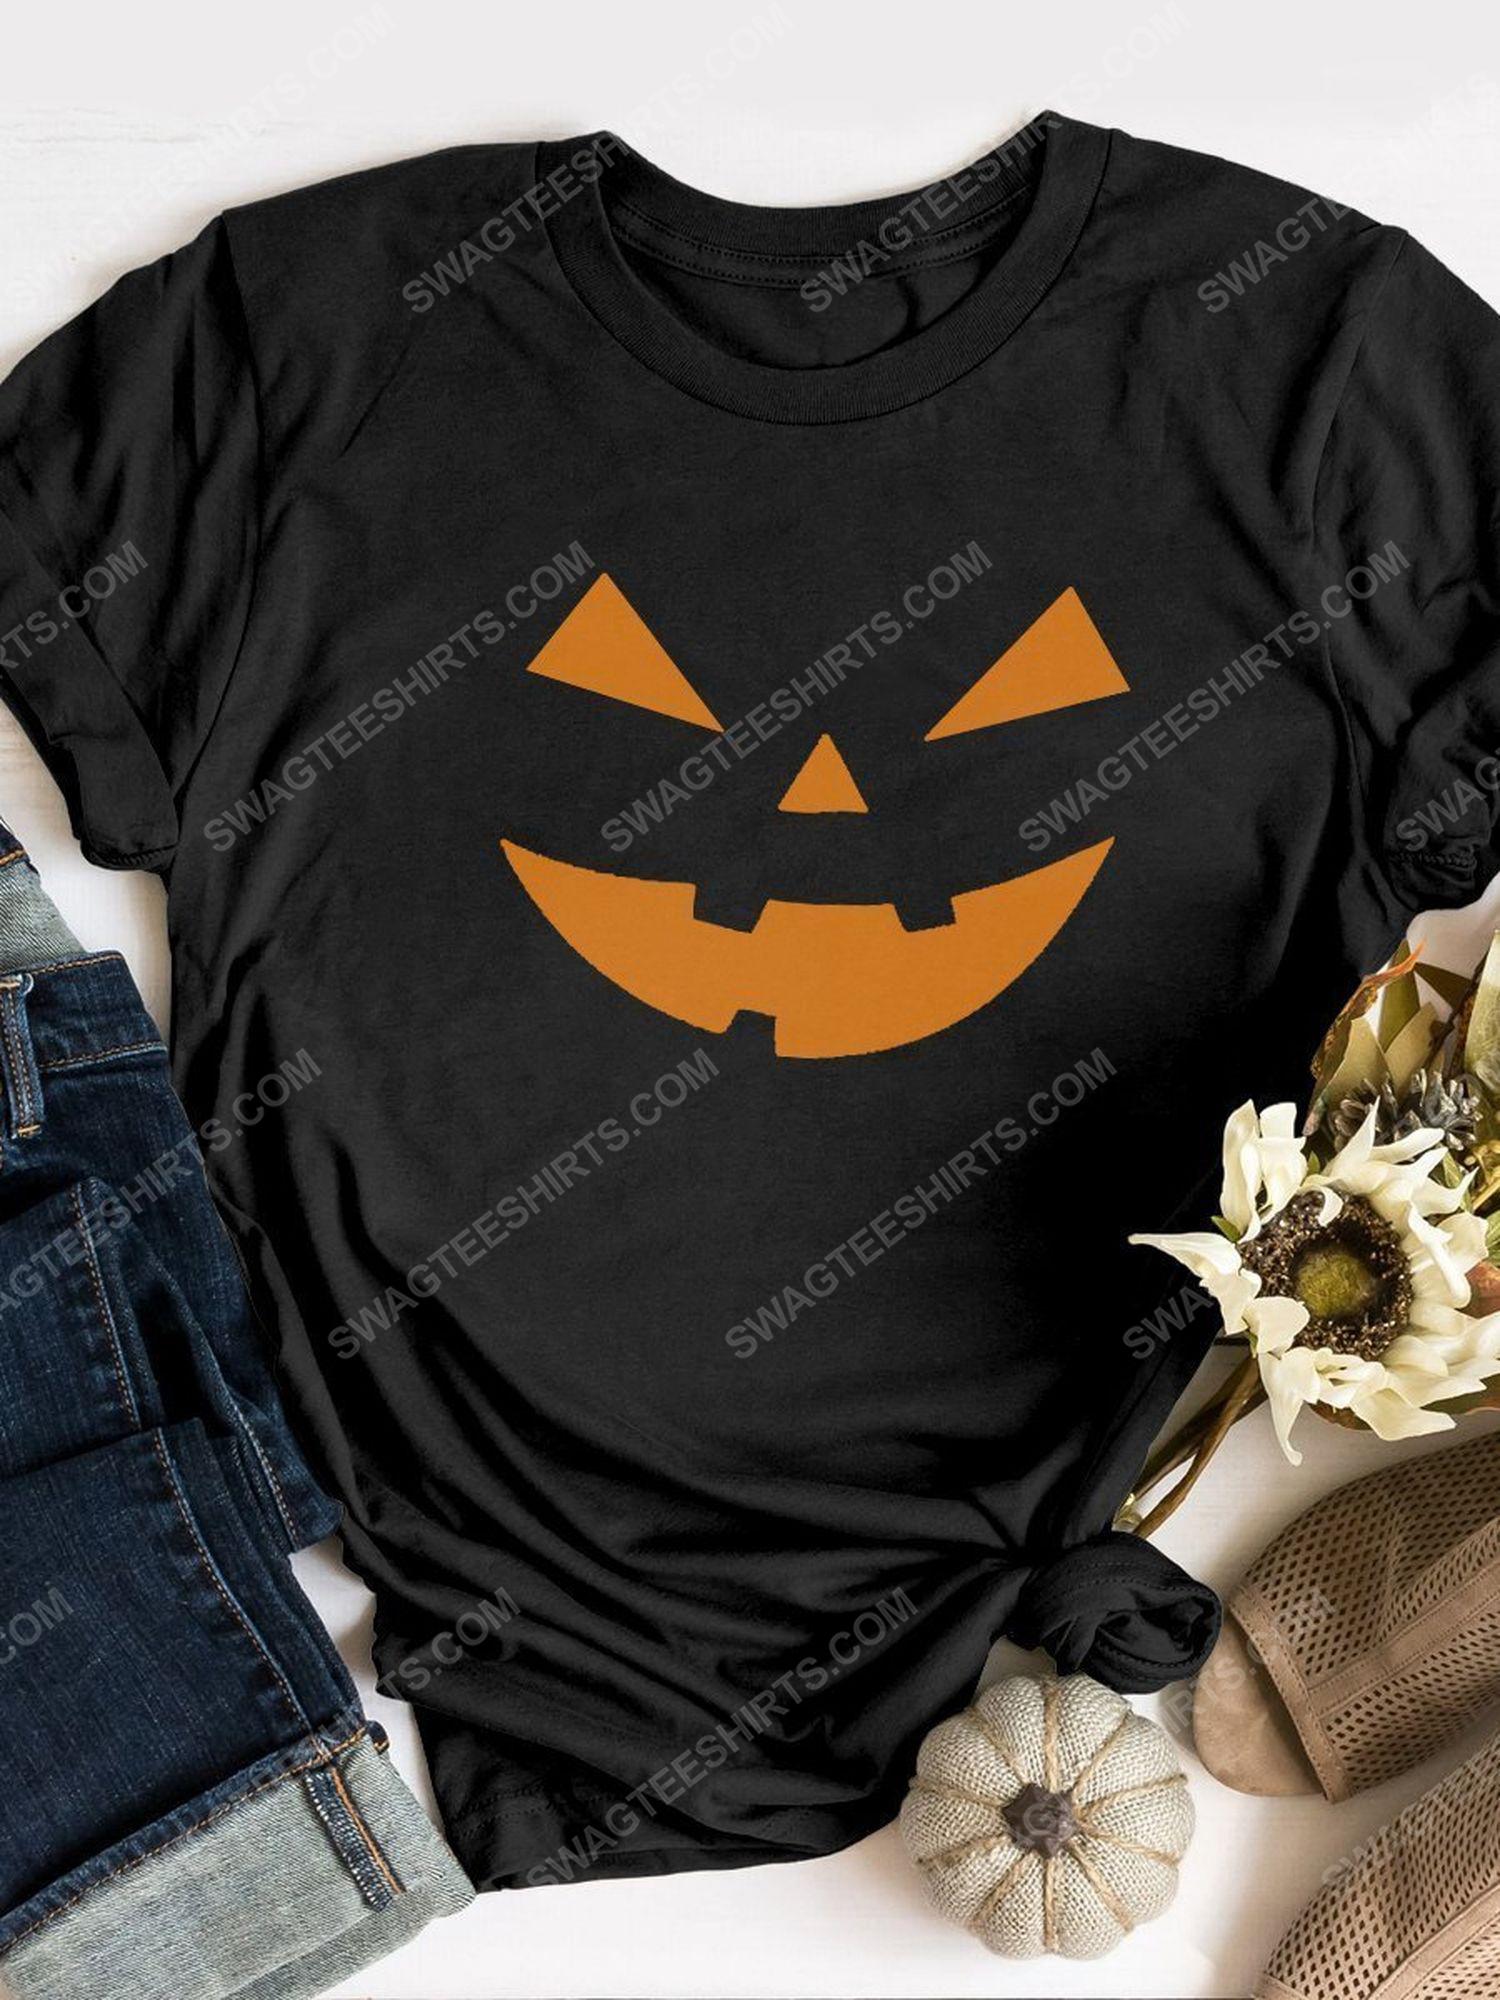 Halloween night and pumpkin face shirt 1 - Copy (3)